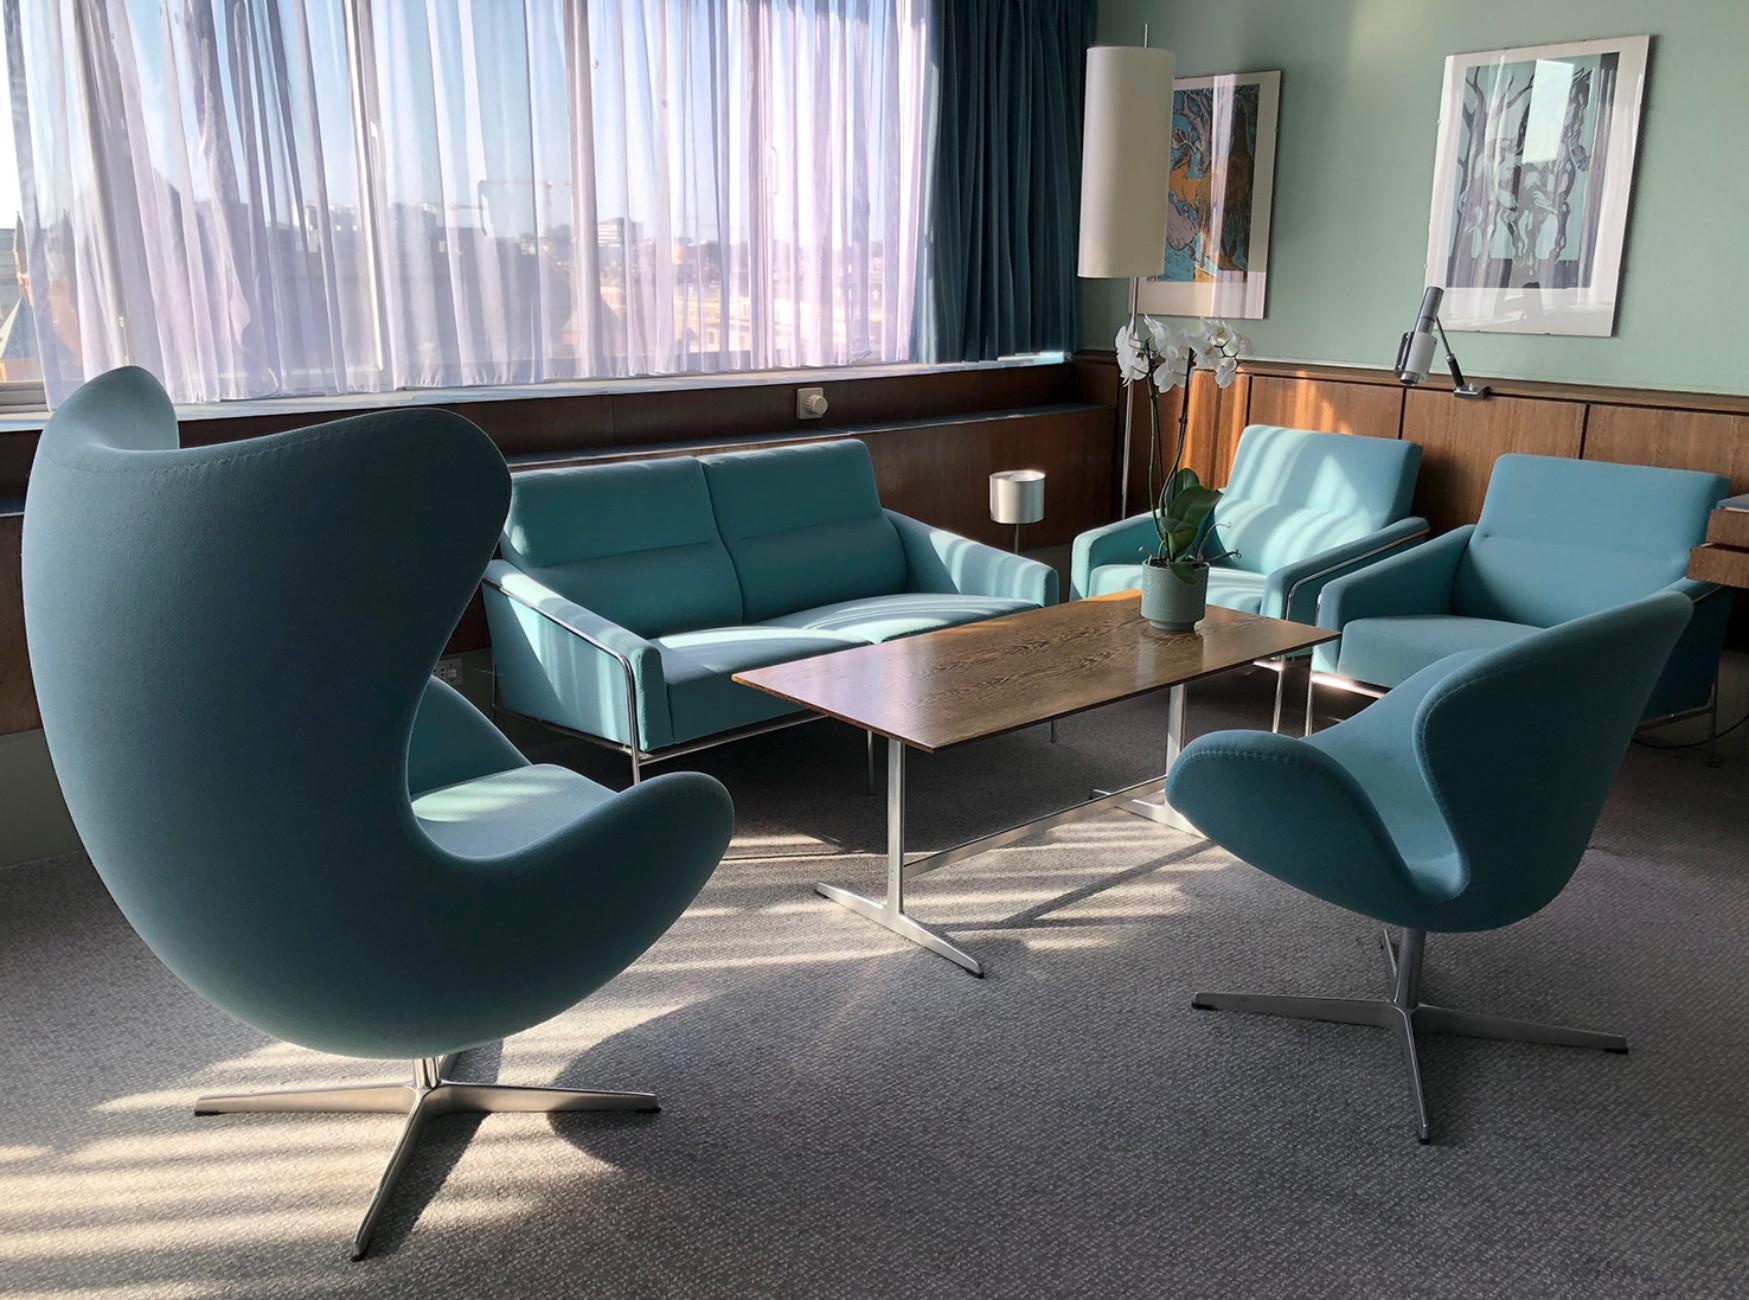 Arne Jacobsen Suite 606 im Royal Copenhagen/ Radisson Collection Hotel